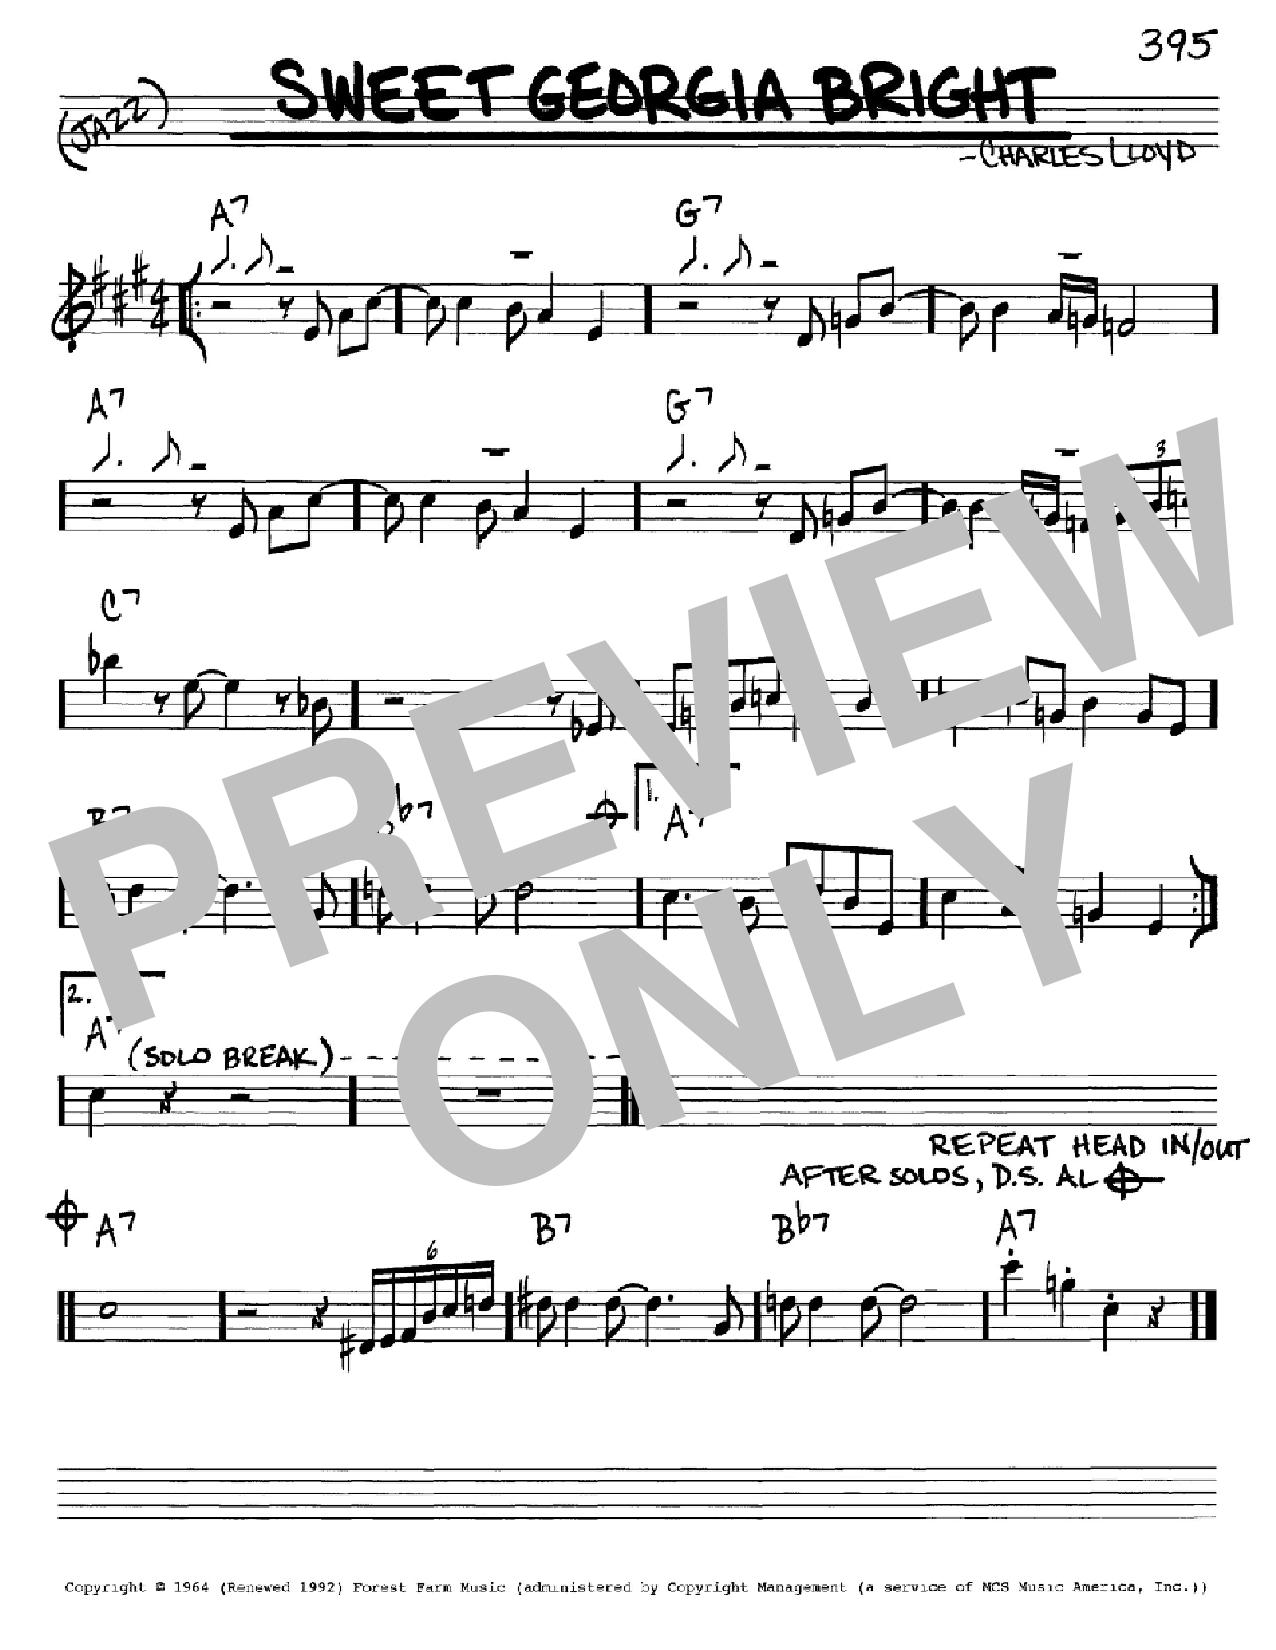 Partition autre Sweet Georgia Bright de Charles Lloyd - Real Book, Melodie et Accords, Inst. En Mib